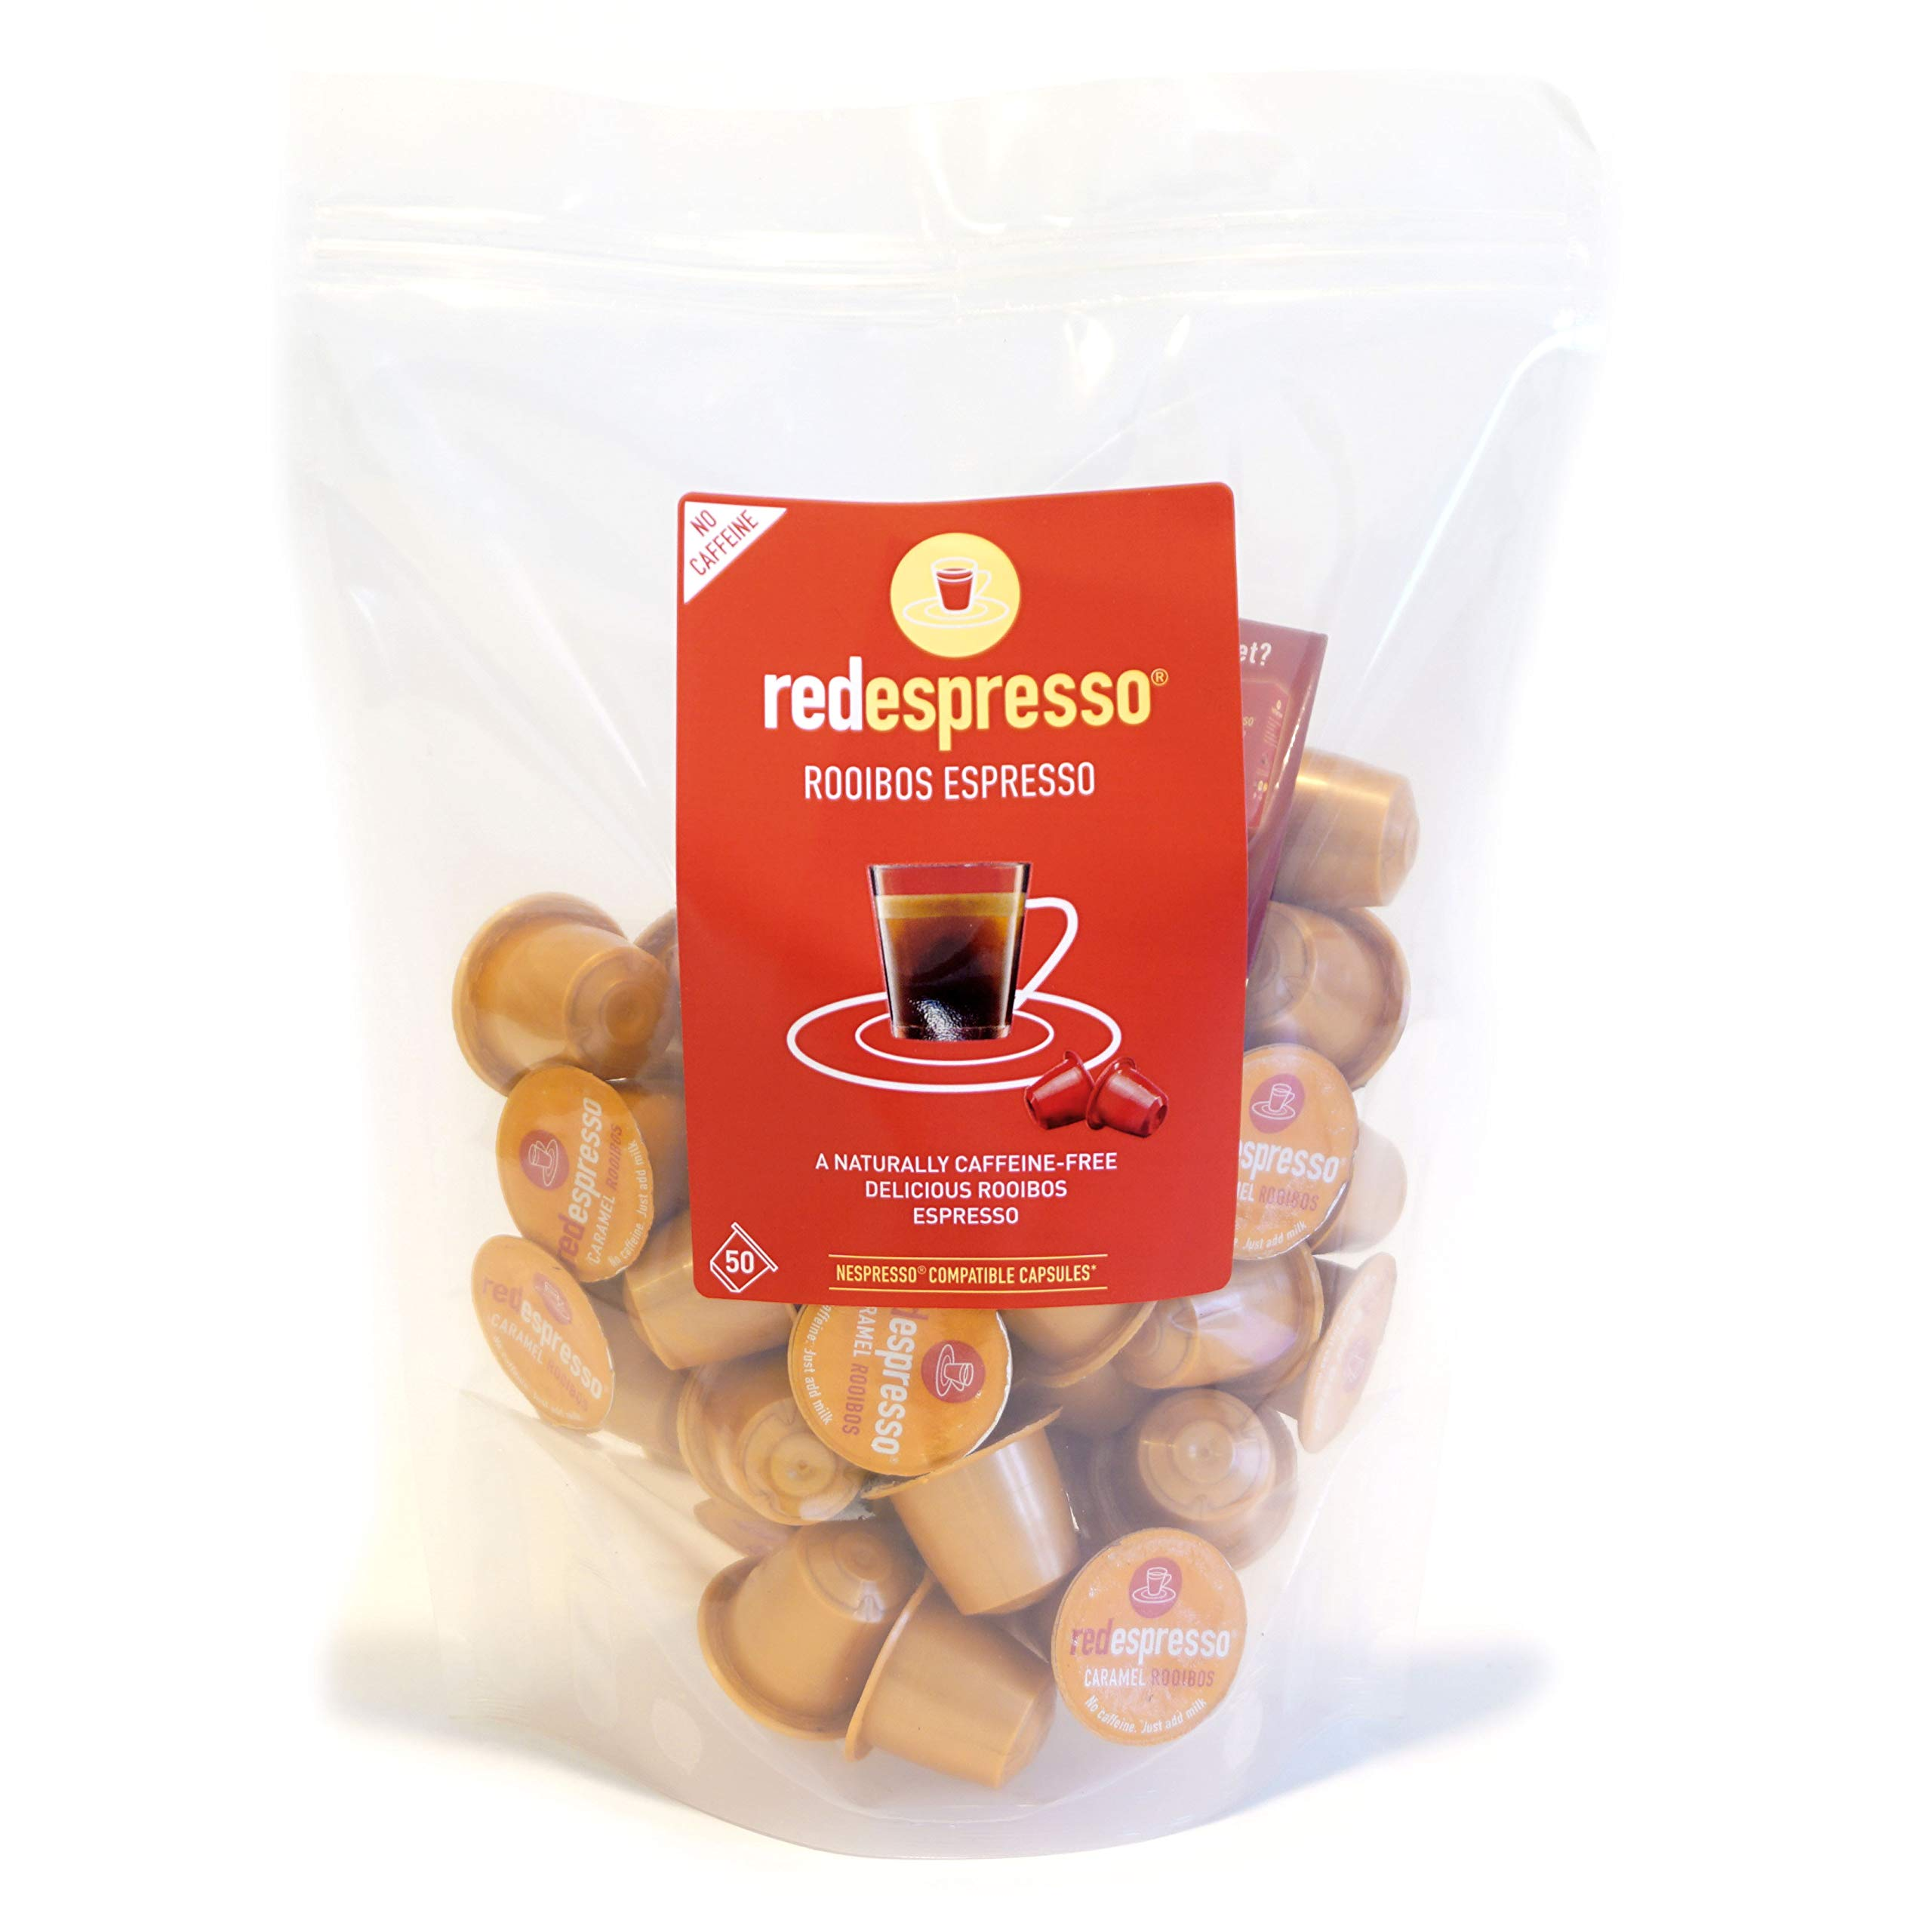 Red Espresso - Caramel Rooibos Tea Capsules (50 CAPSULES) - Nespresso Compatible - Vegan, Non GMO, Organic, Antioxidant, Age-Defying